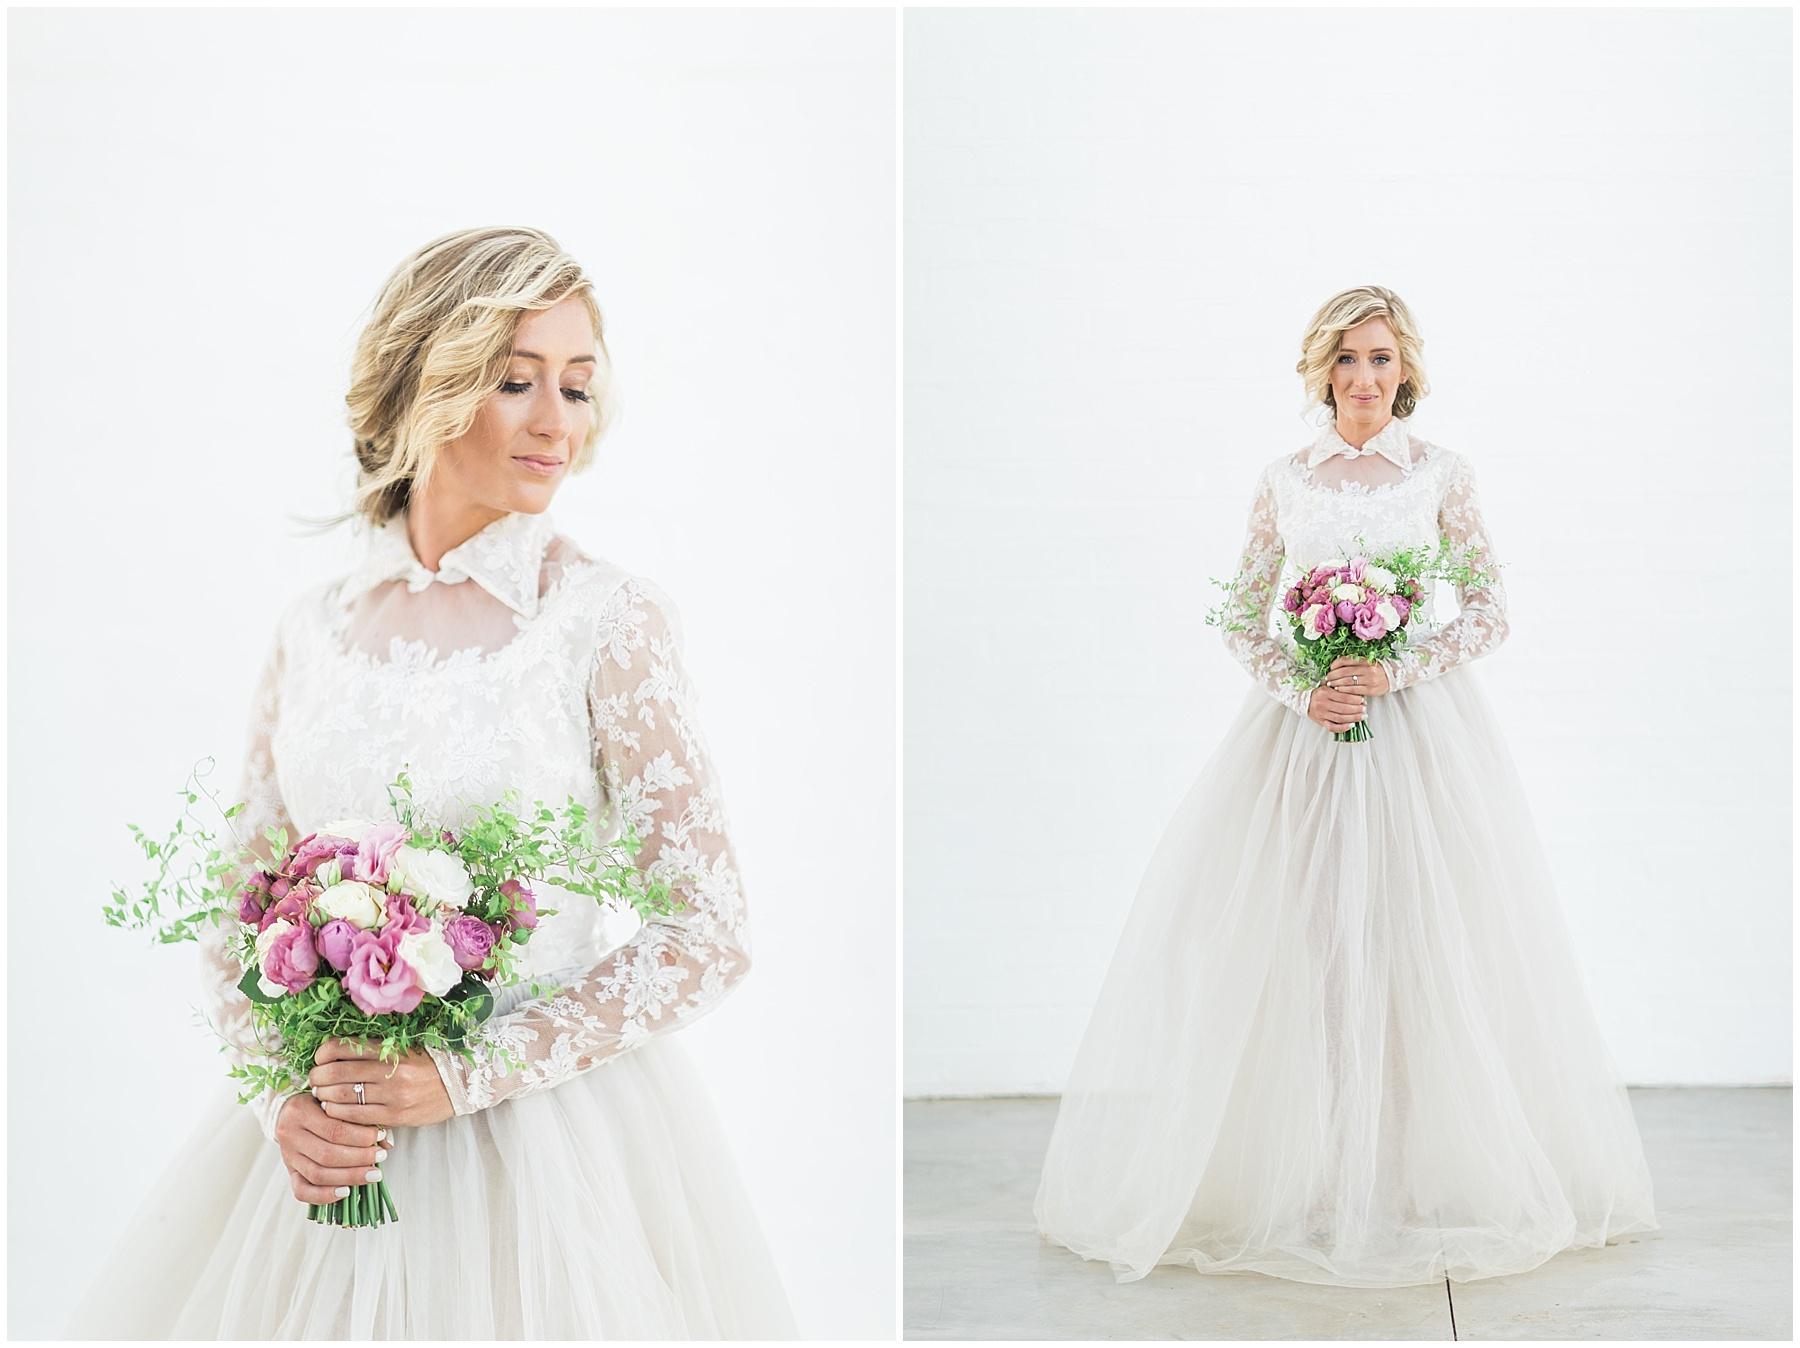 AliciaLandman_JoleneandZander_Wedding_The Pretty Blog_0425.jpg